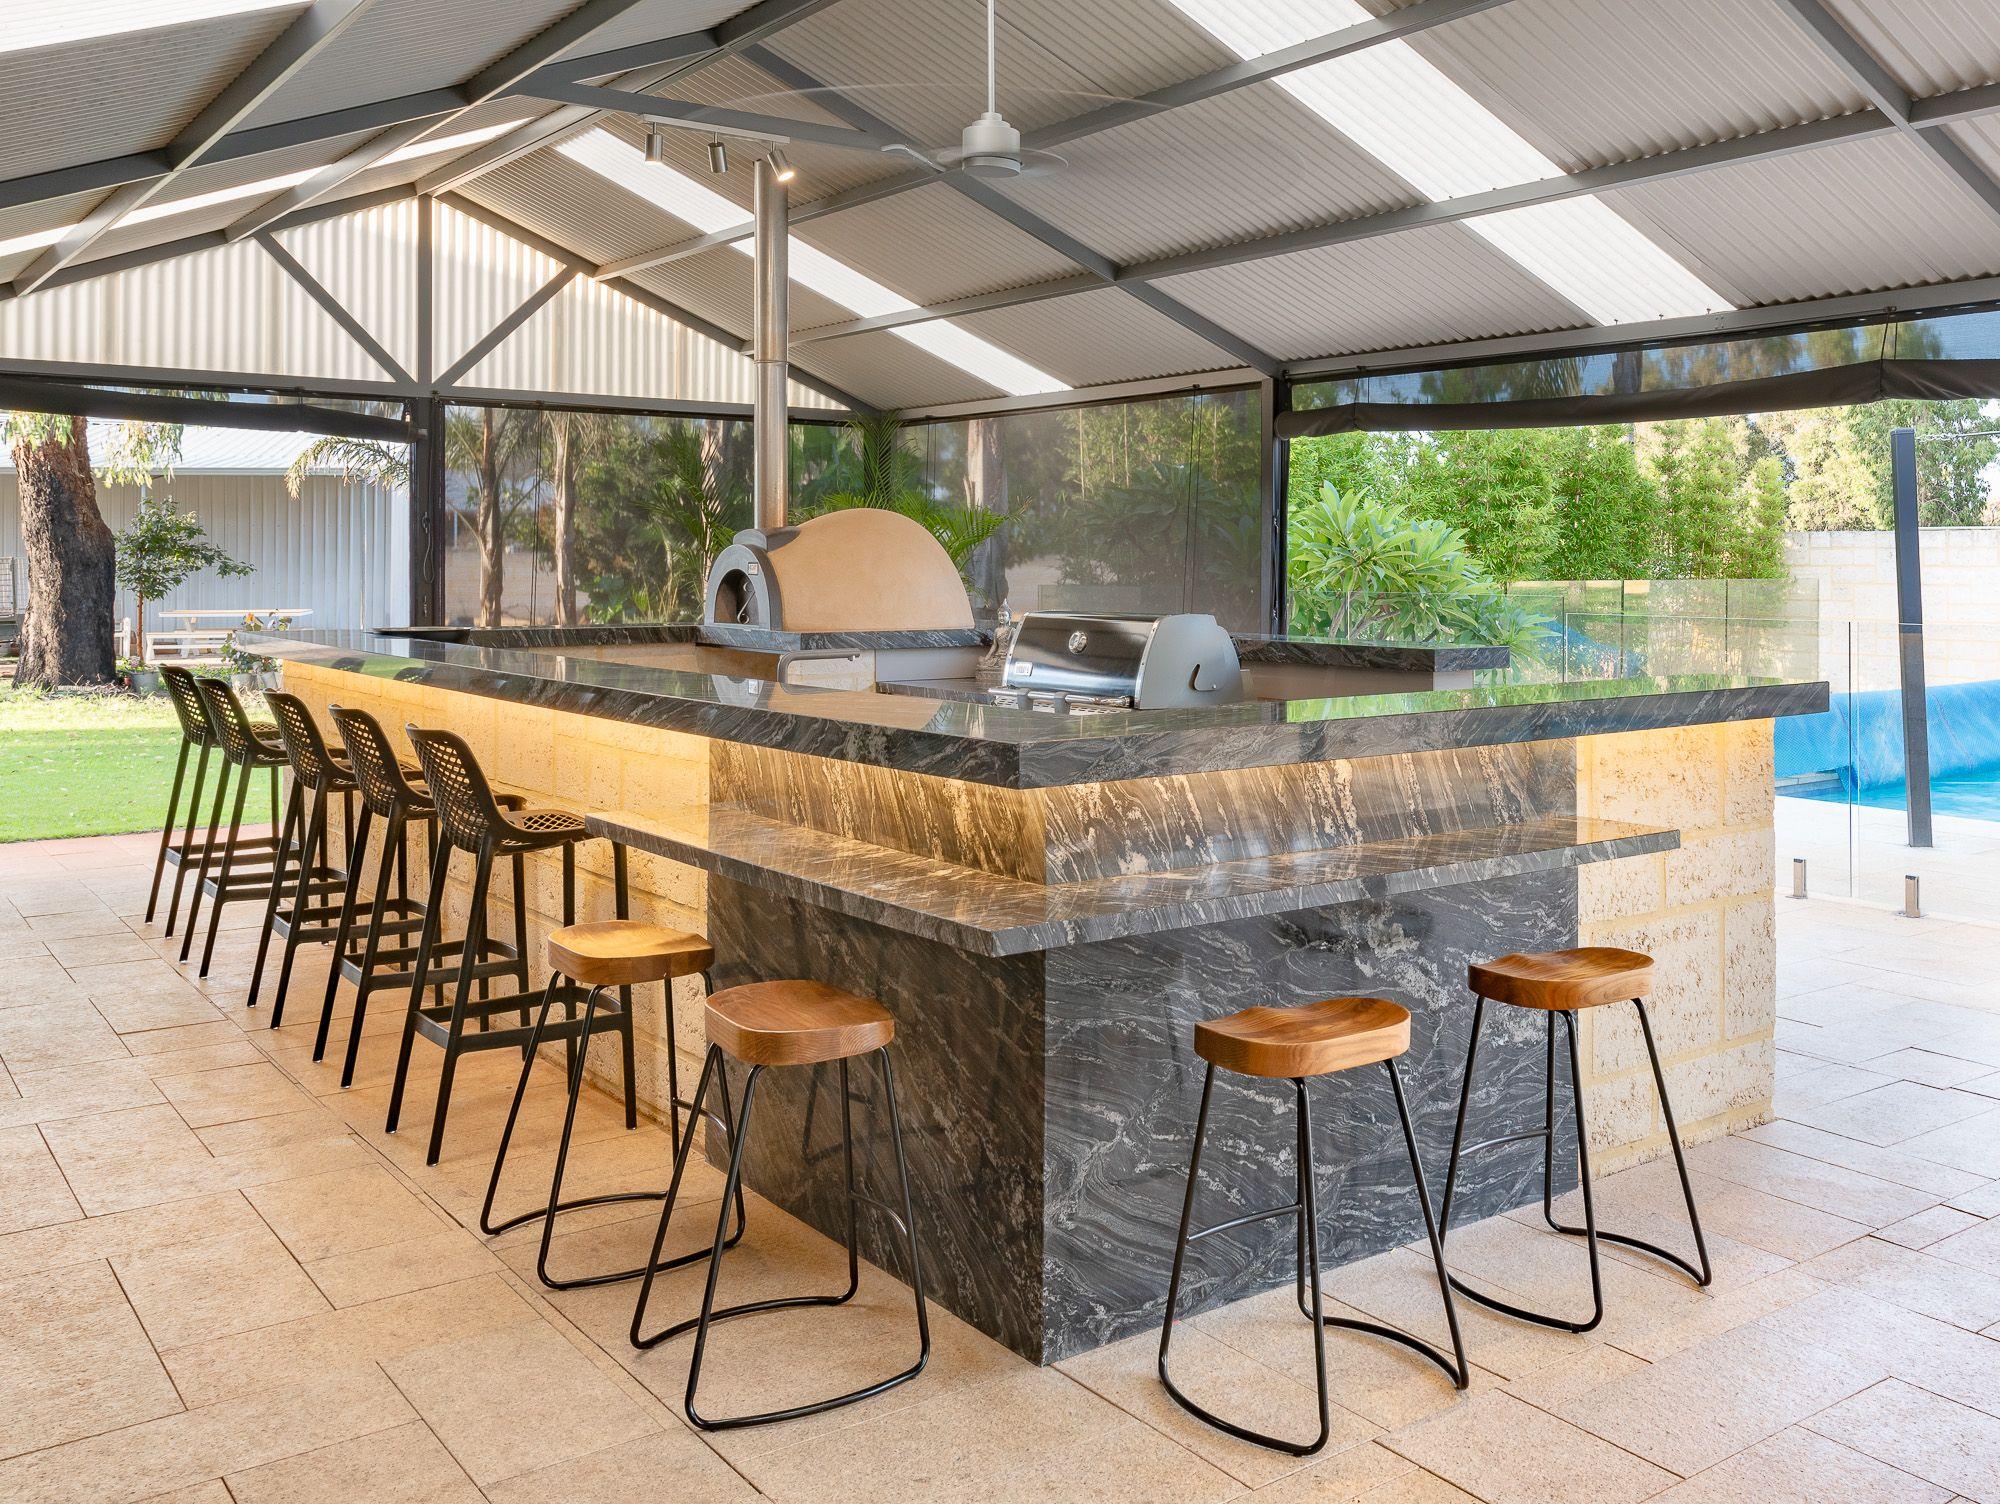 Our most extravagant Outdoor Alfresco Kitchen install yet